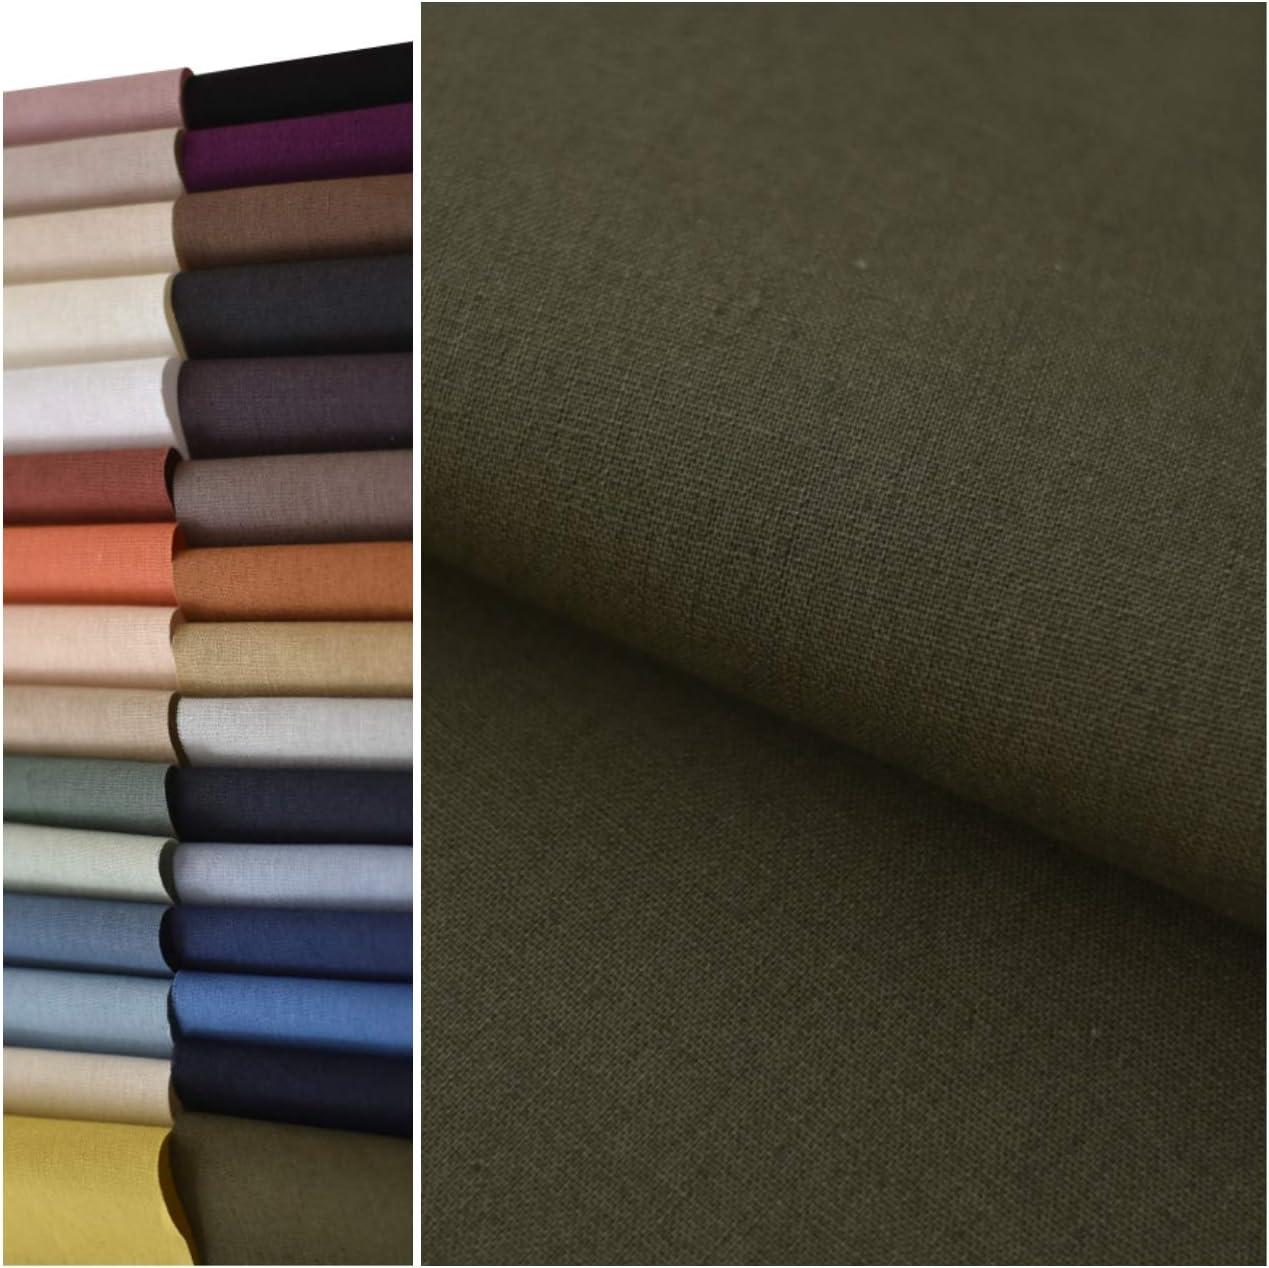 COTTONVILL 11COUNT Linen 大特価 Blend Solid Washing 3yard ストアー Fabric Bio